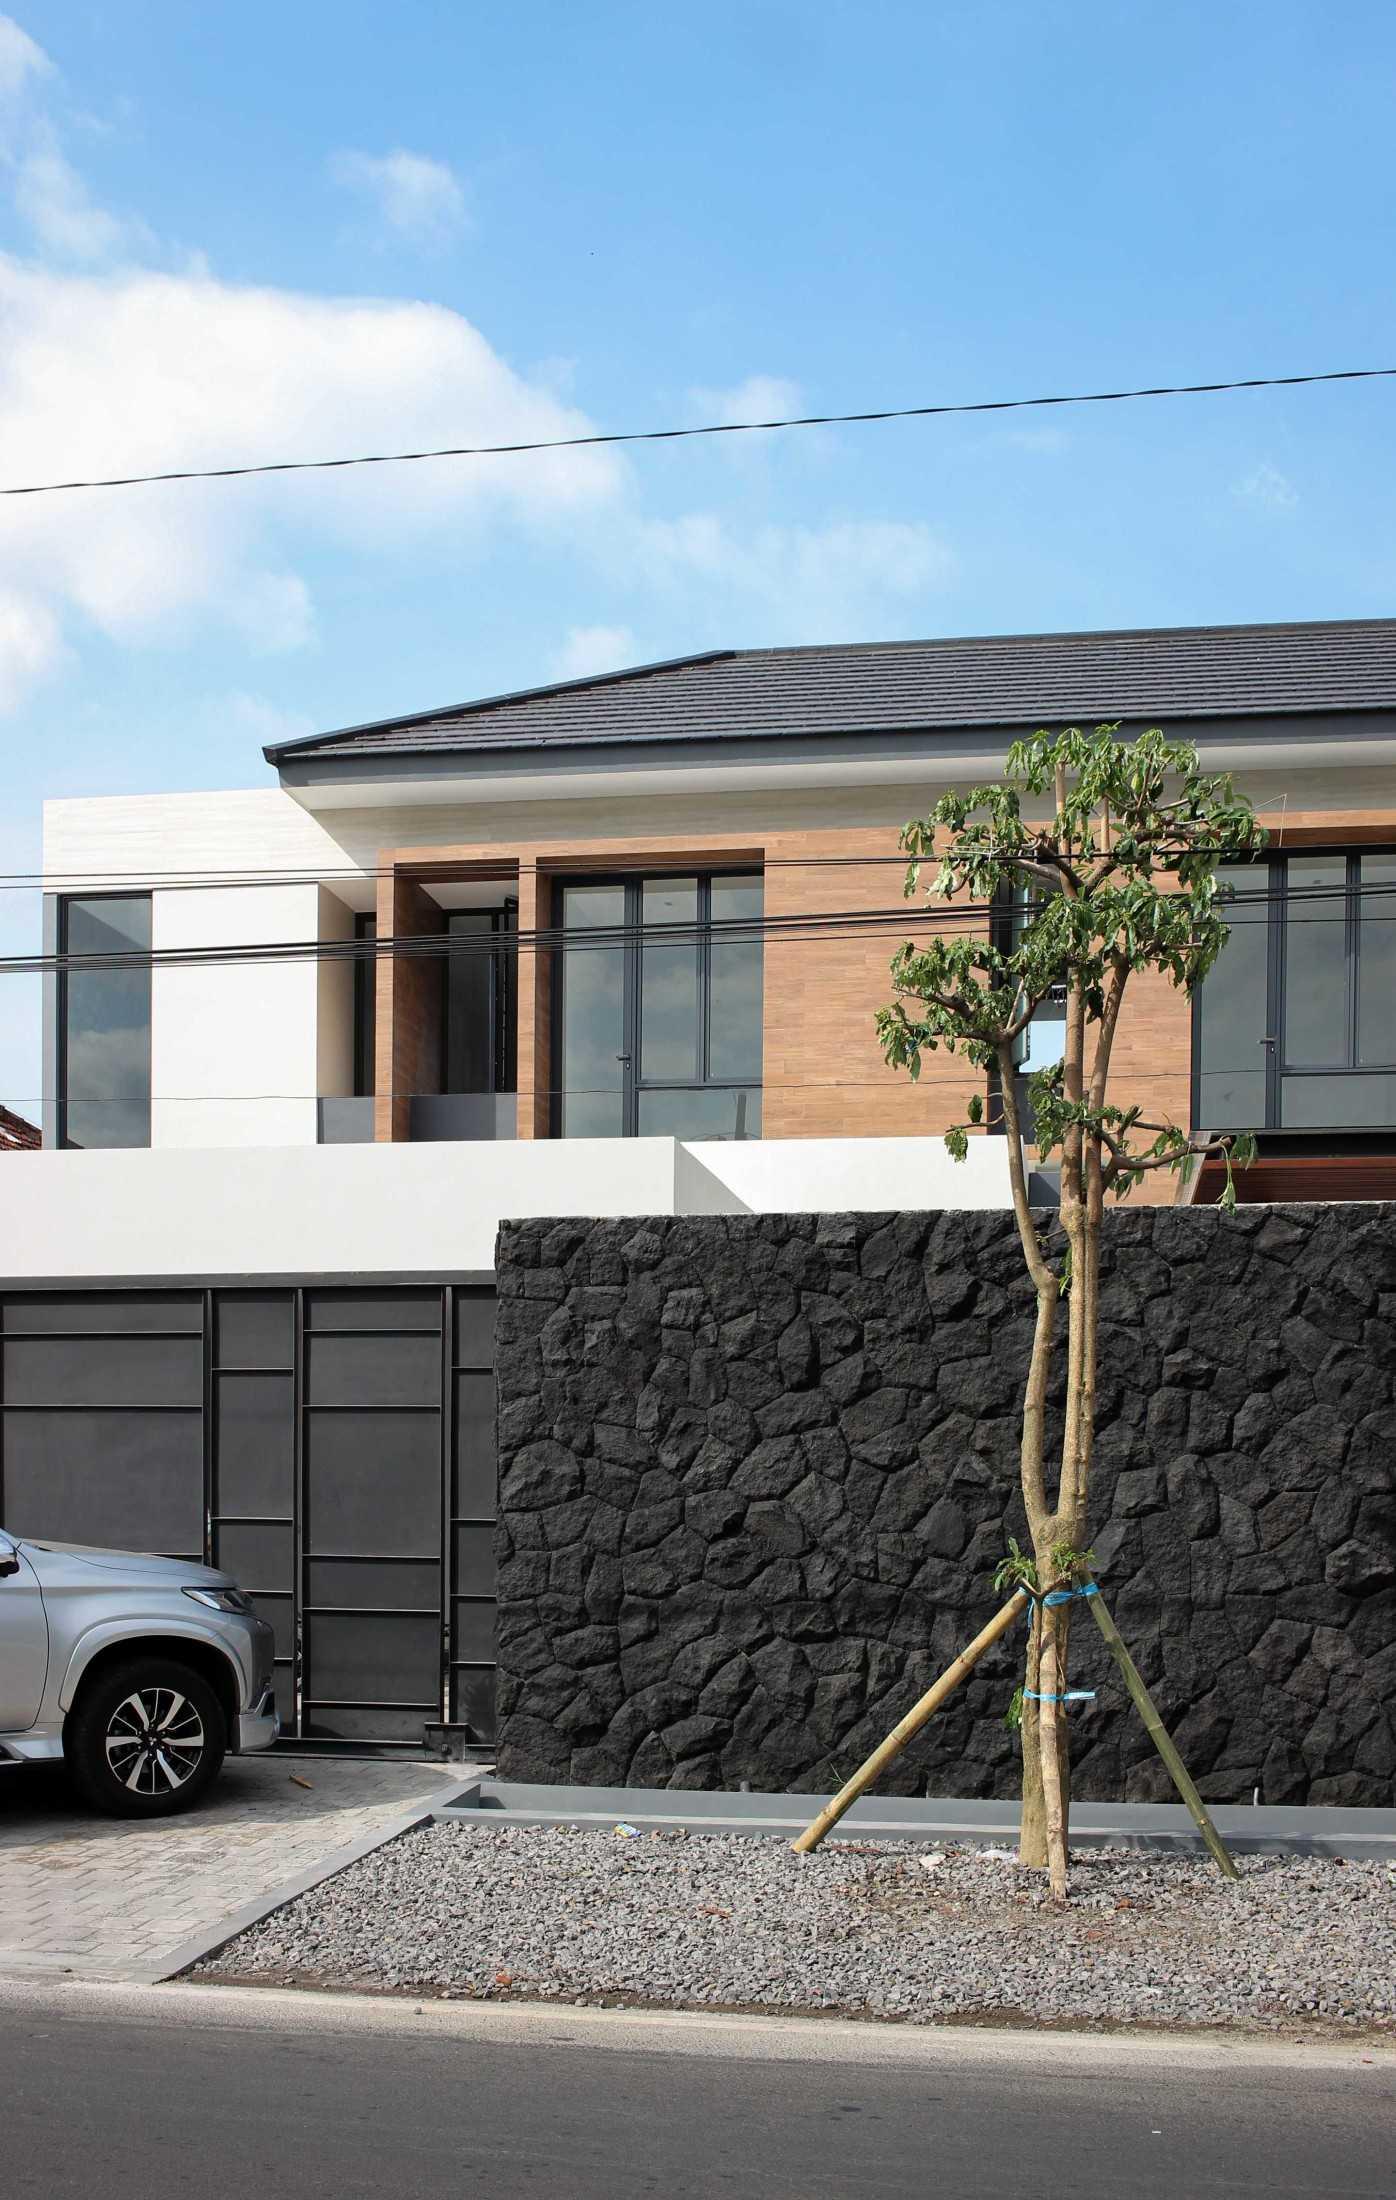 Y0 Design Architect S House Kec. Srono, Kabupaten Banyuwangi, Jawa Timur, Indonesia Kec. Srono, Kabupaten Banyuwangi, Jawa Timur, Indonesia Yohanes-Iswara-Limandjaya-S-House  121067